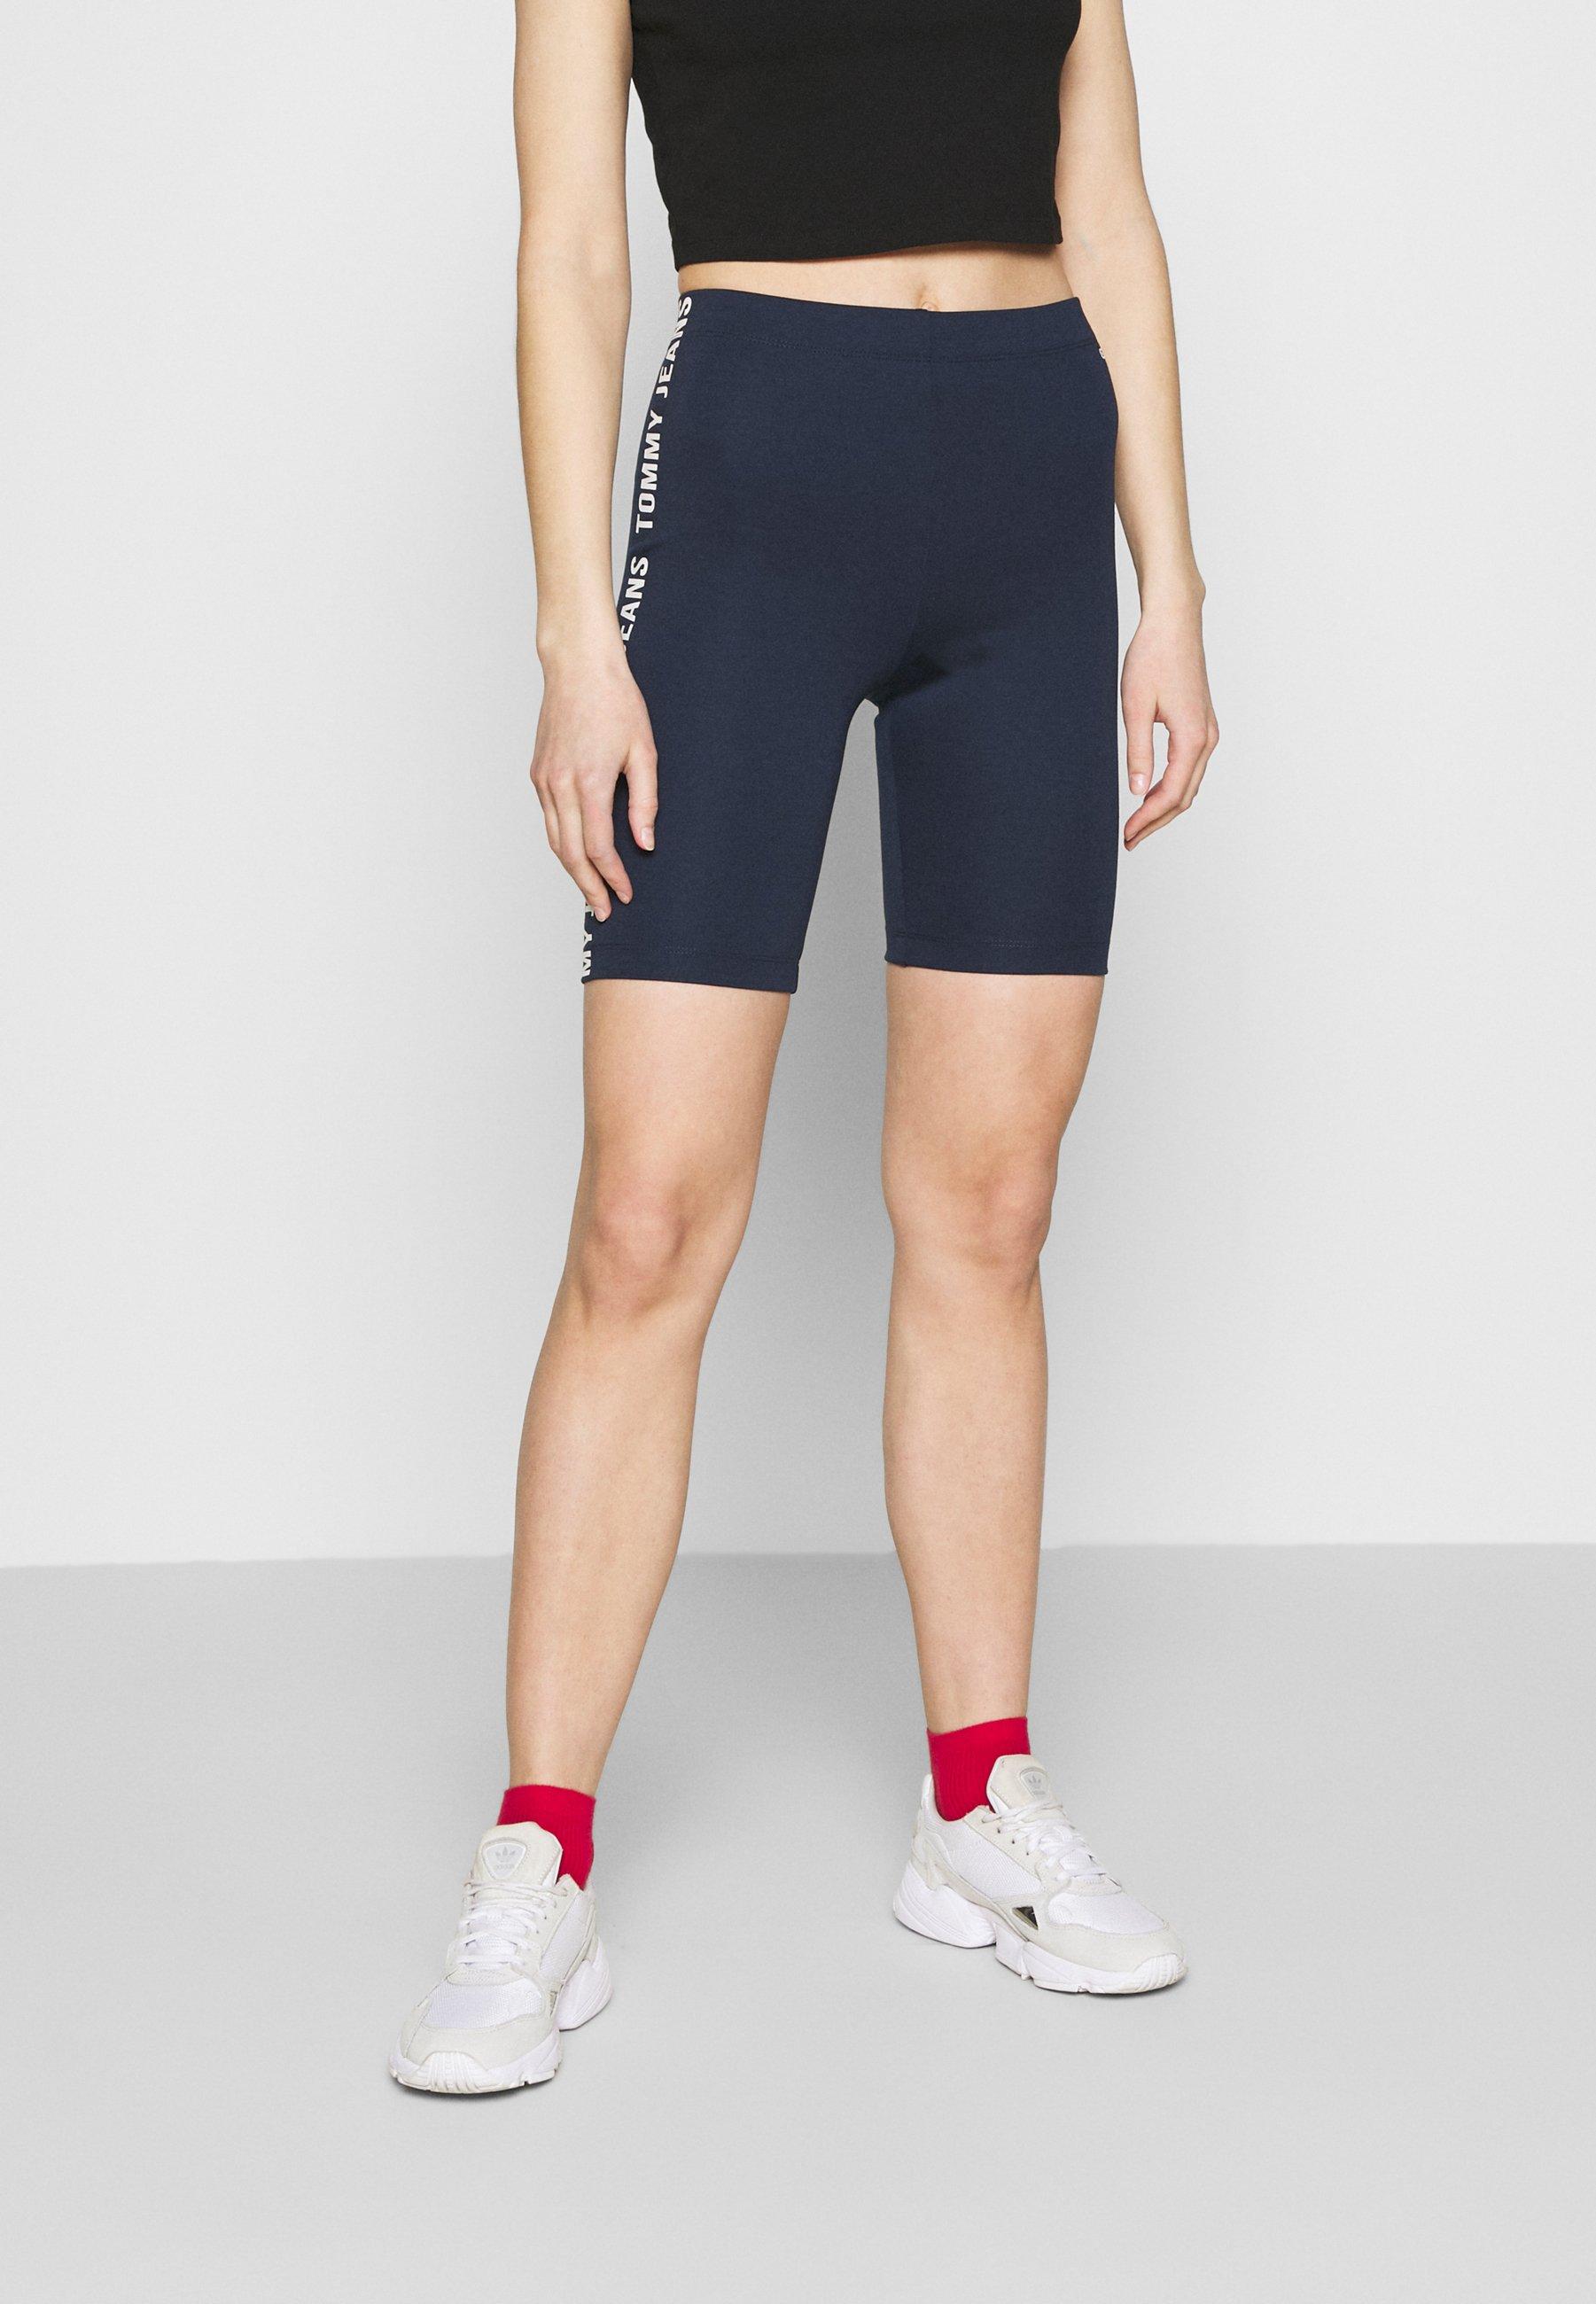 Damen FITTED BRANDED BIKE - Shorts